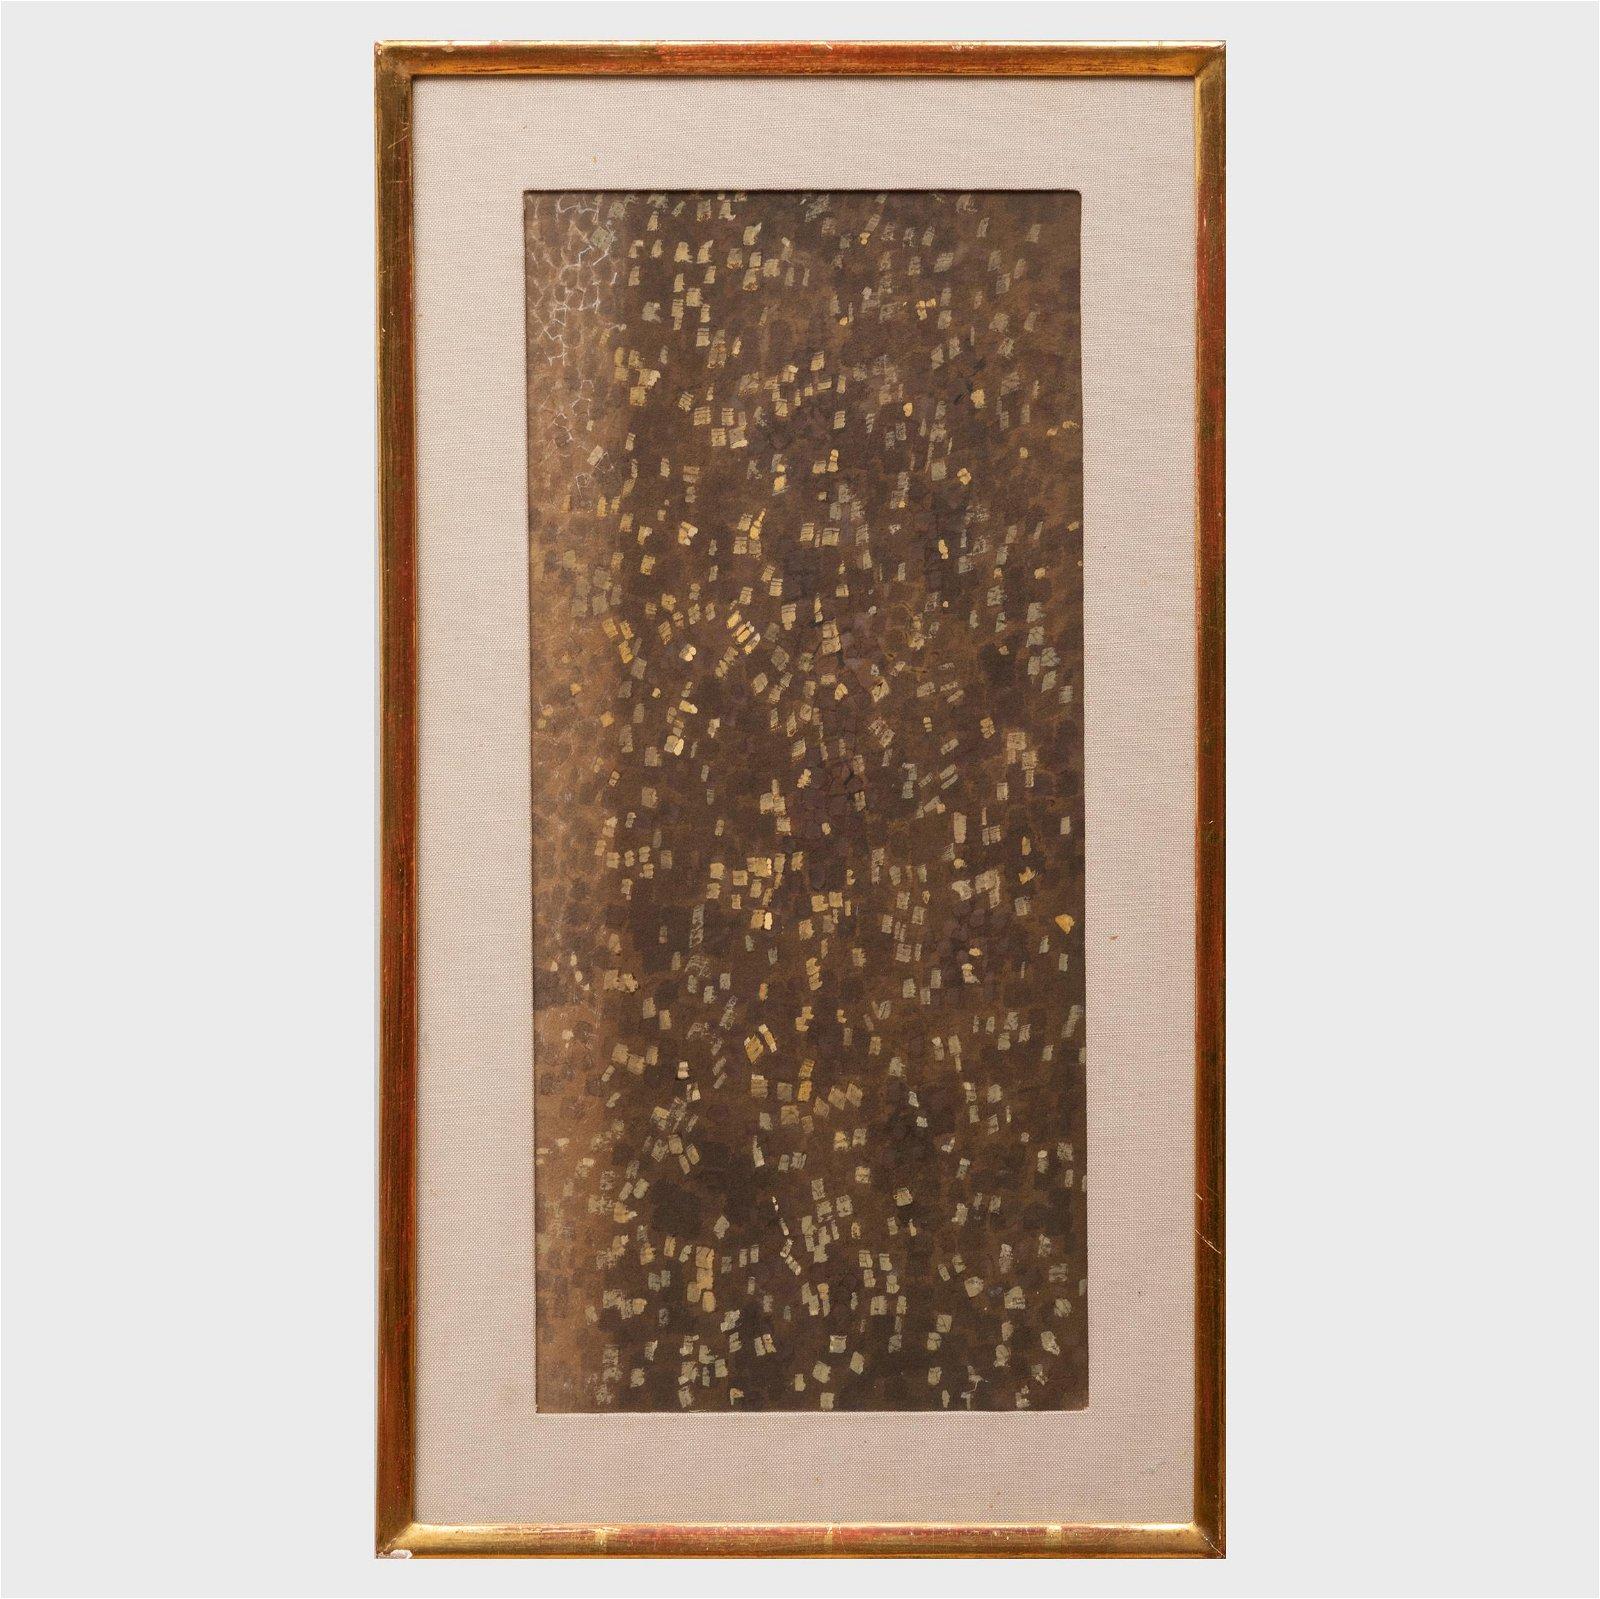 Mark Tobey (1890-1976): Lights